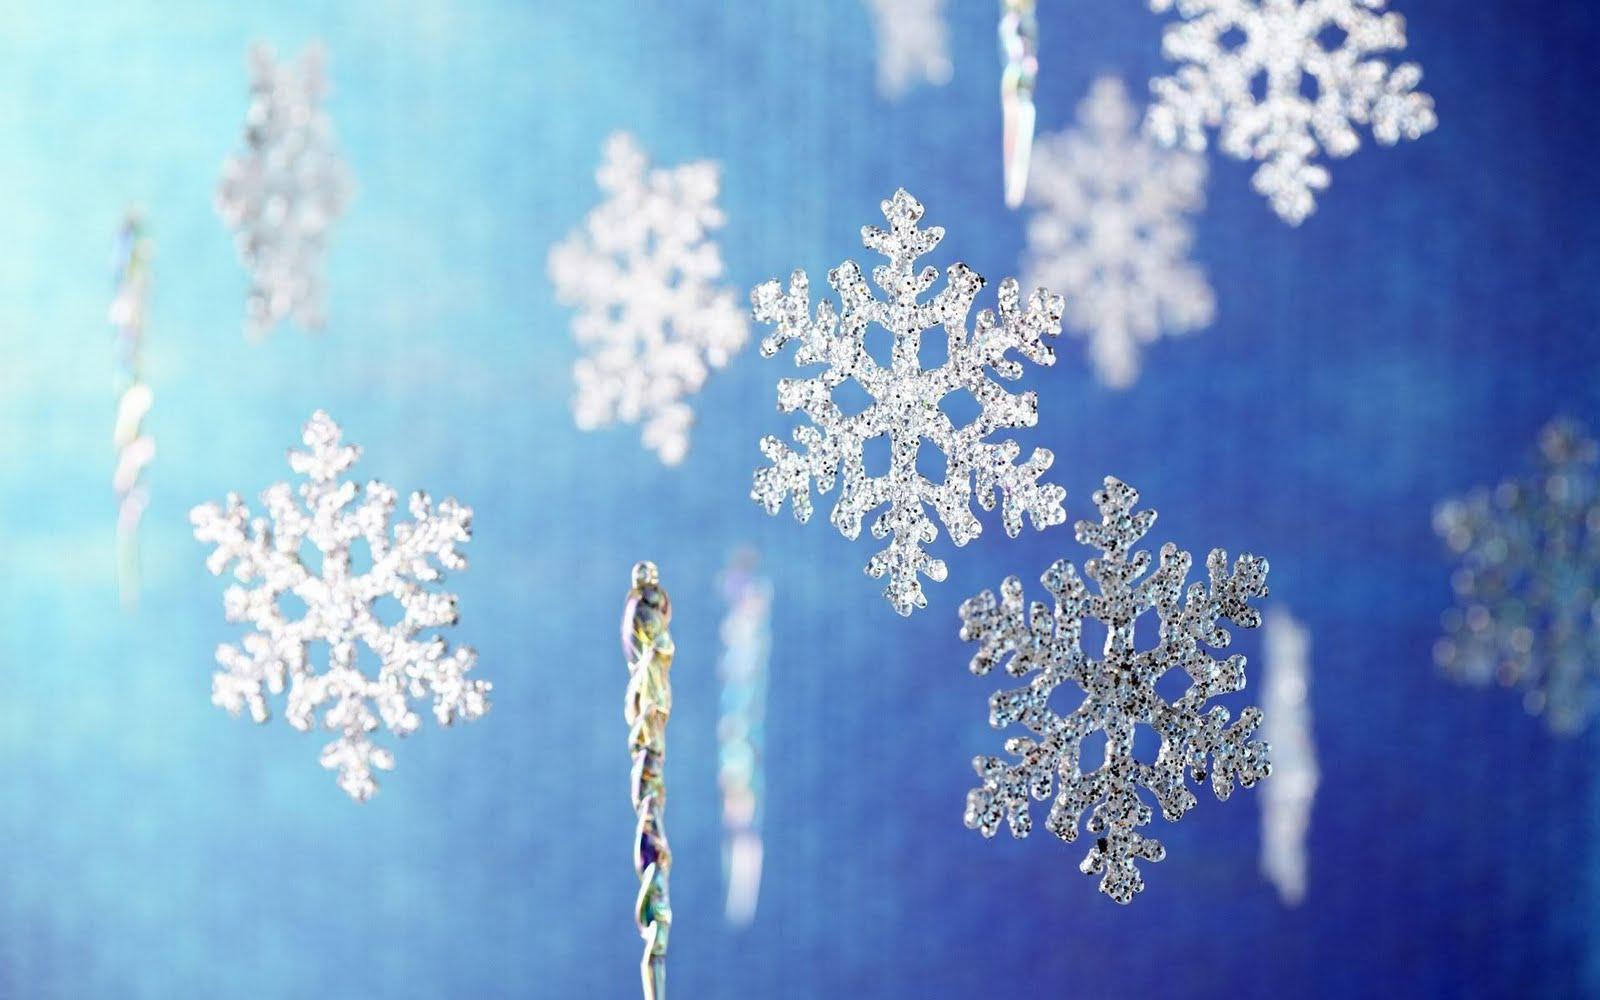 http://cdn.pcwallart.com/images/snowflake-clipart-wallpaper-4.jpg